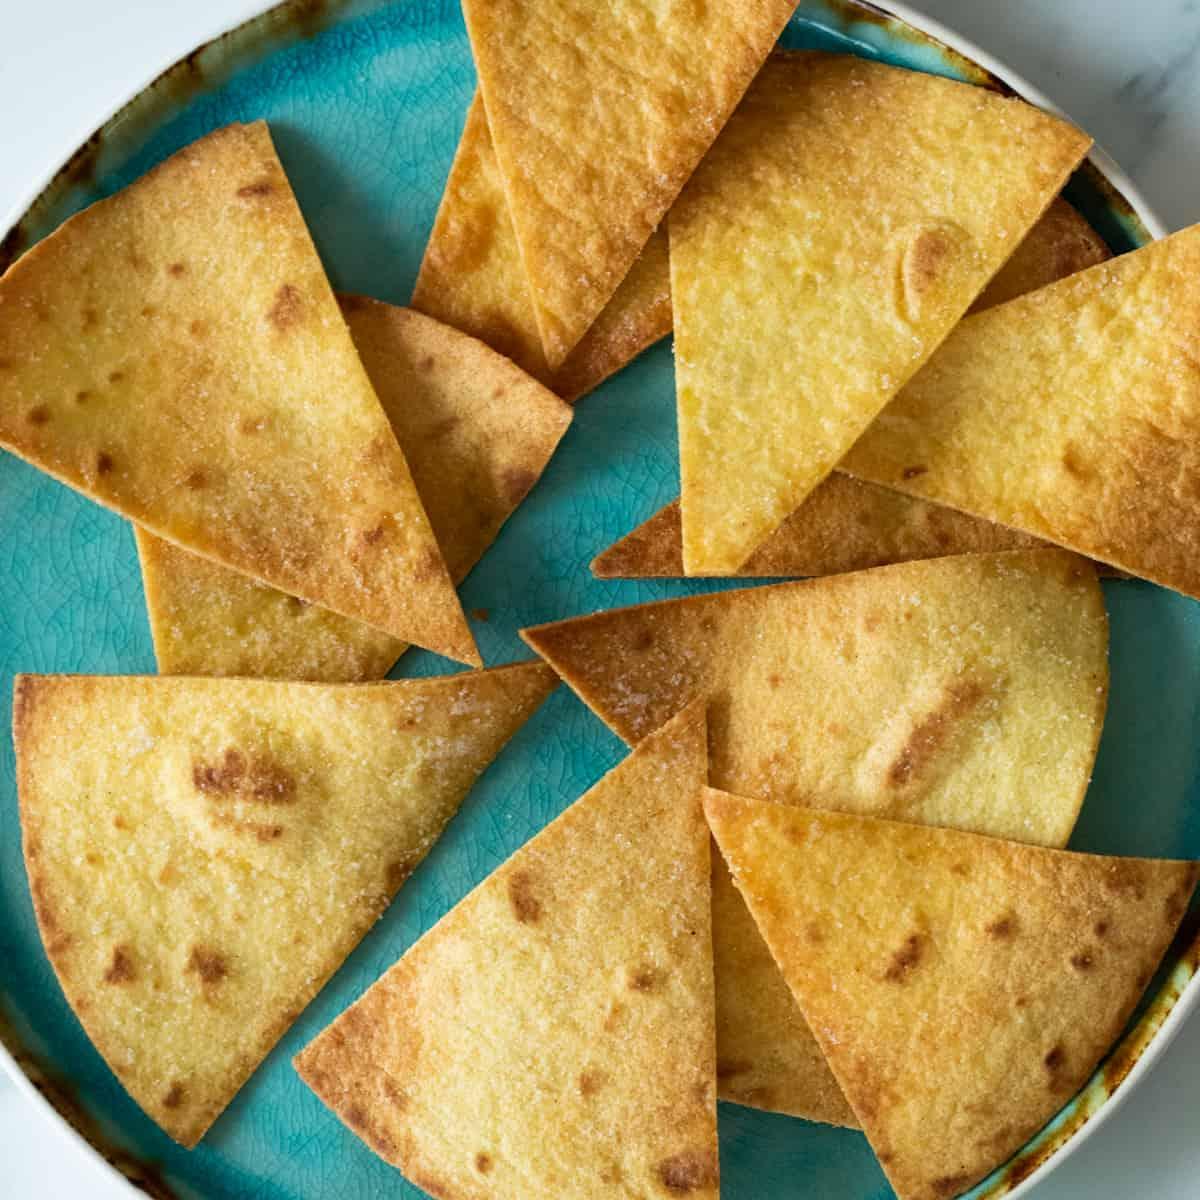 homemade tortilla chips on a blue plate